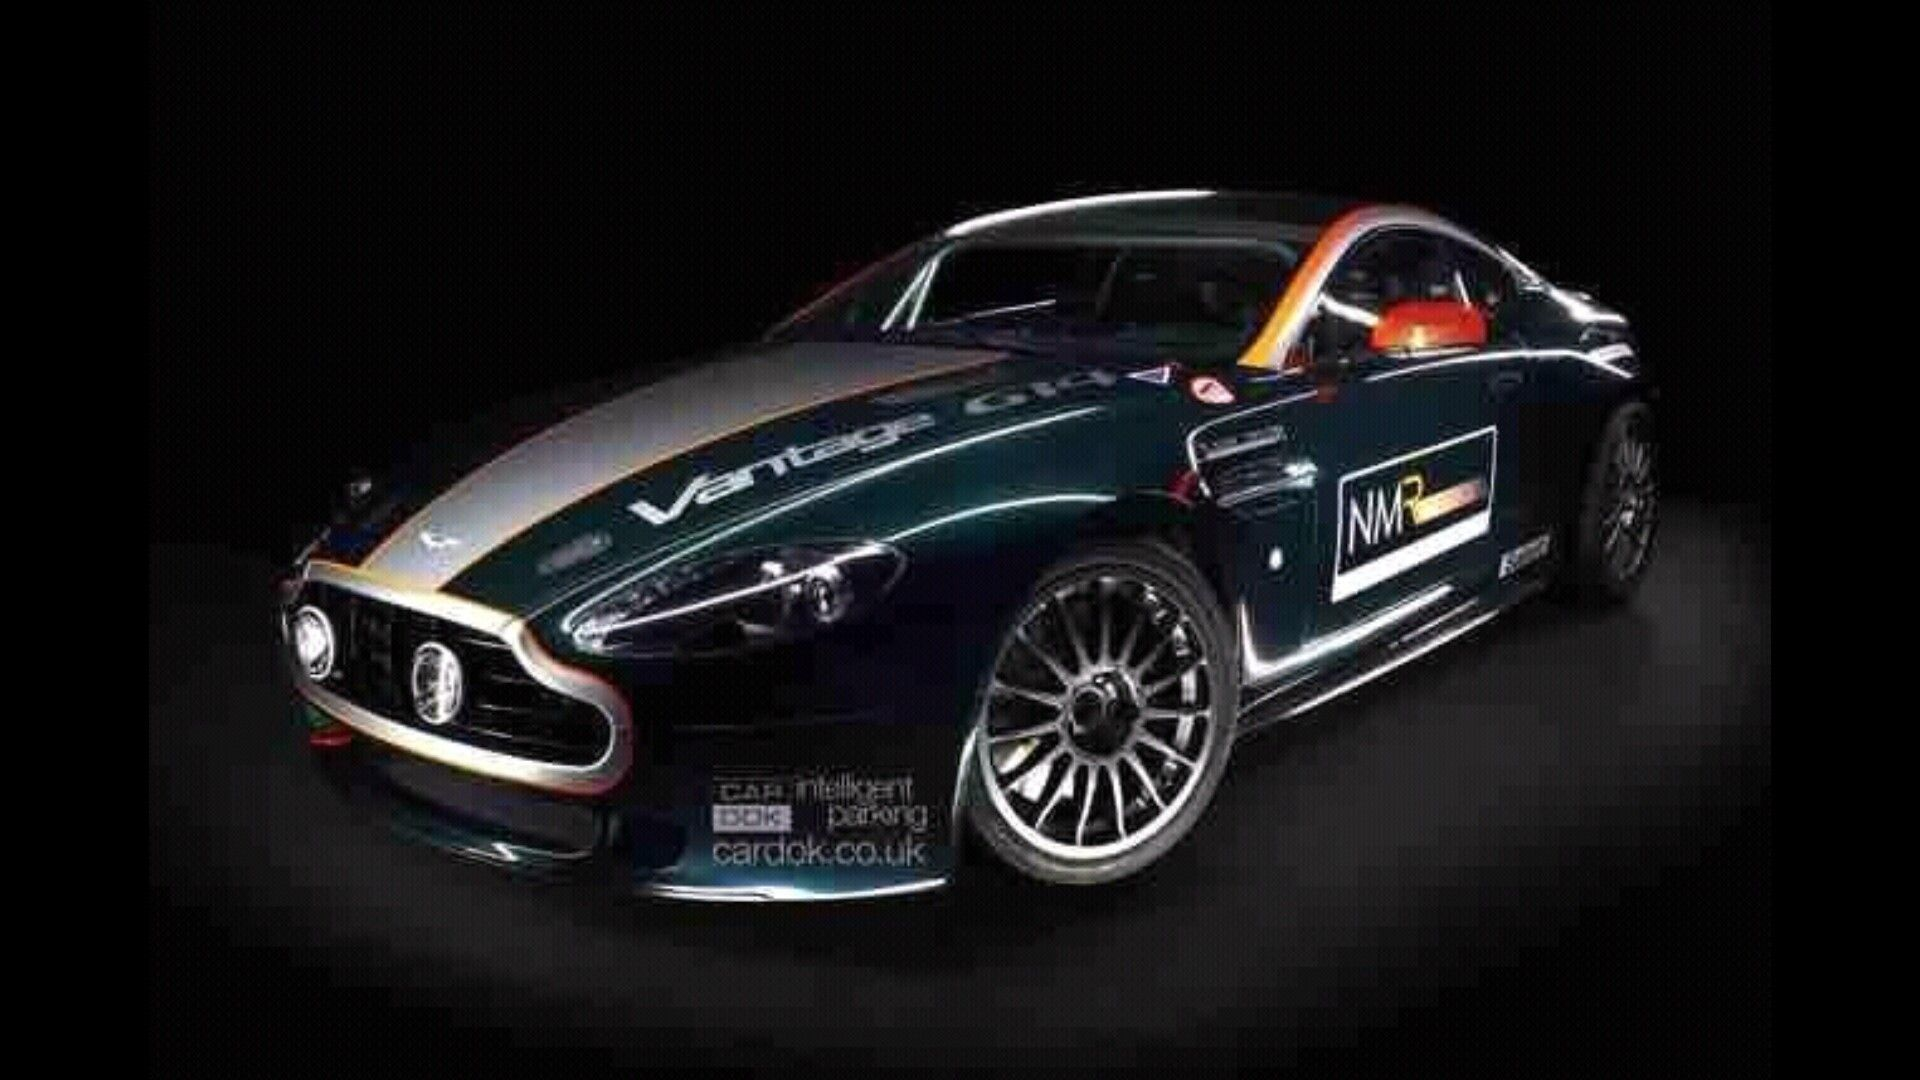 Aston martin v8 website martin o malley board cars motorcycles resolutions php news html